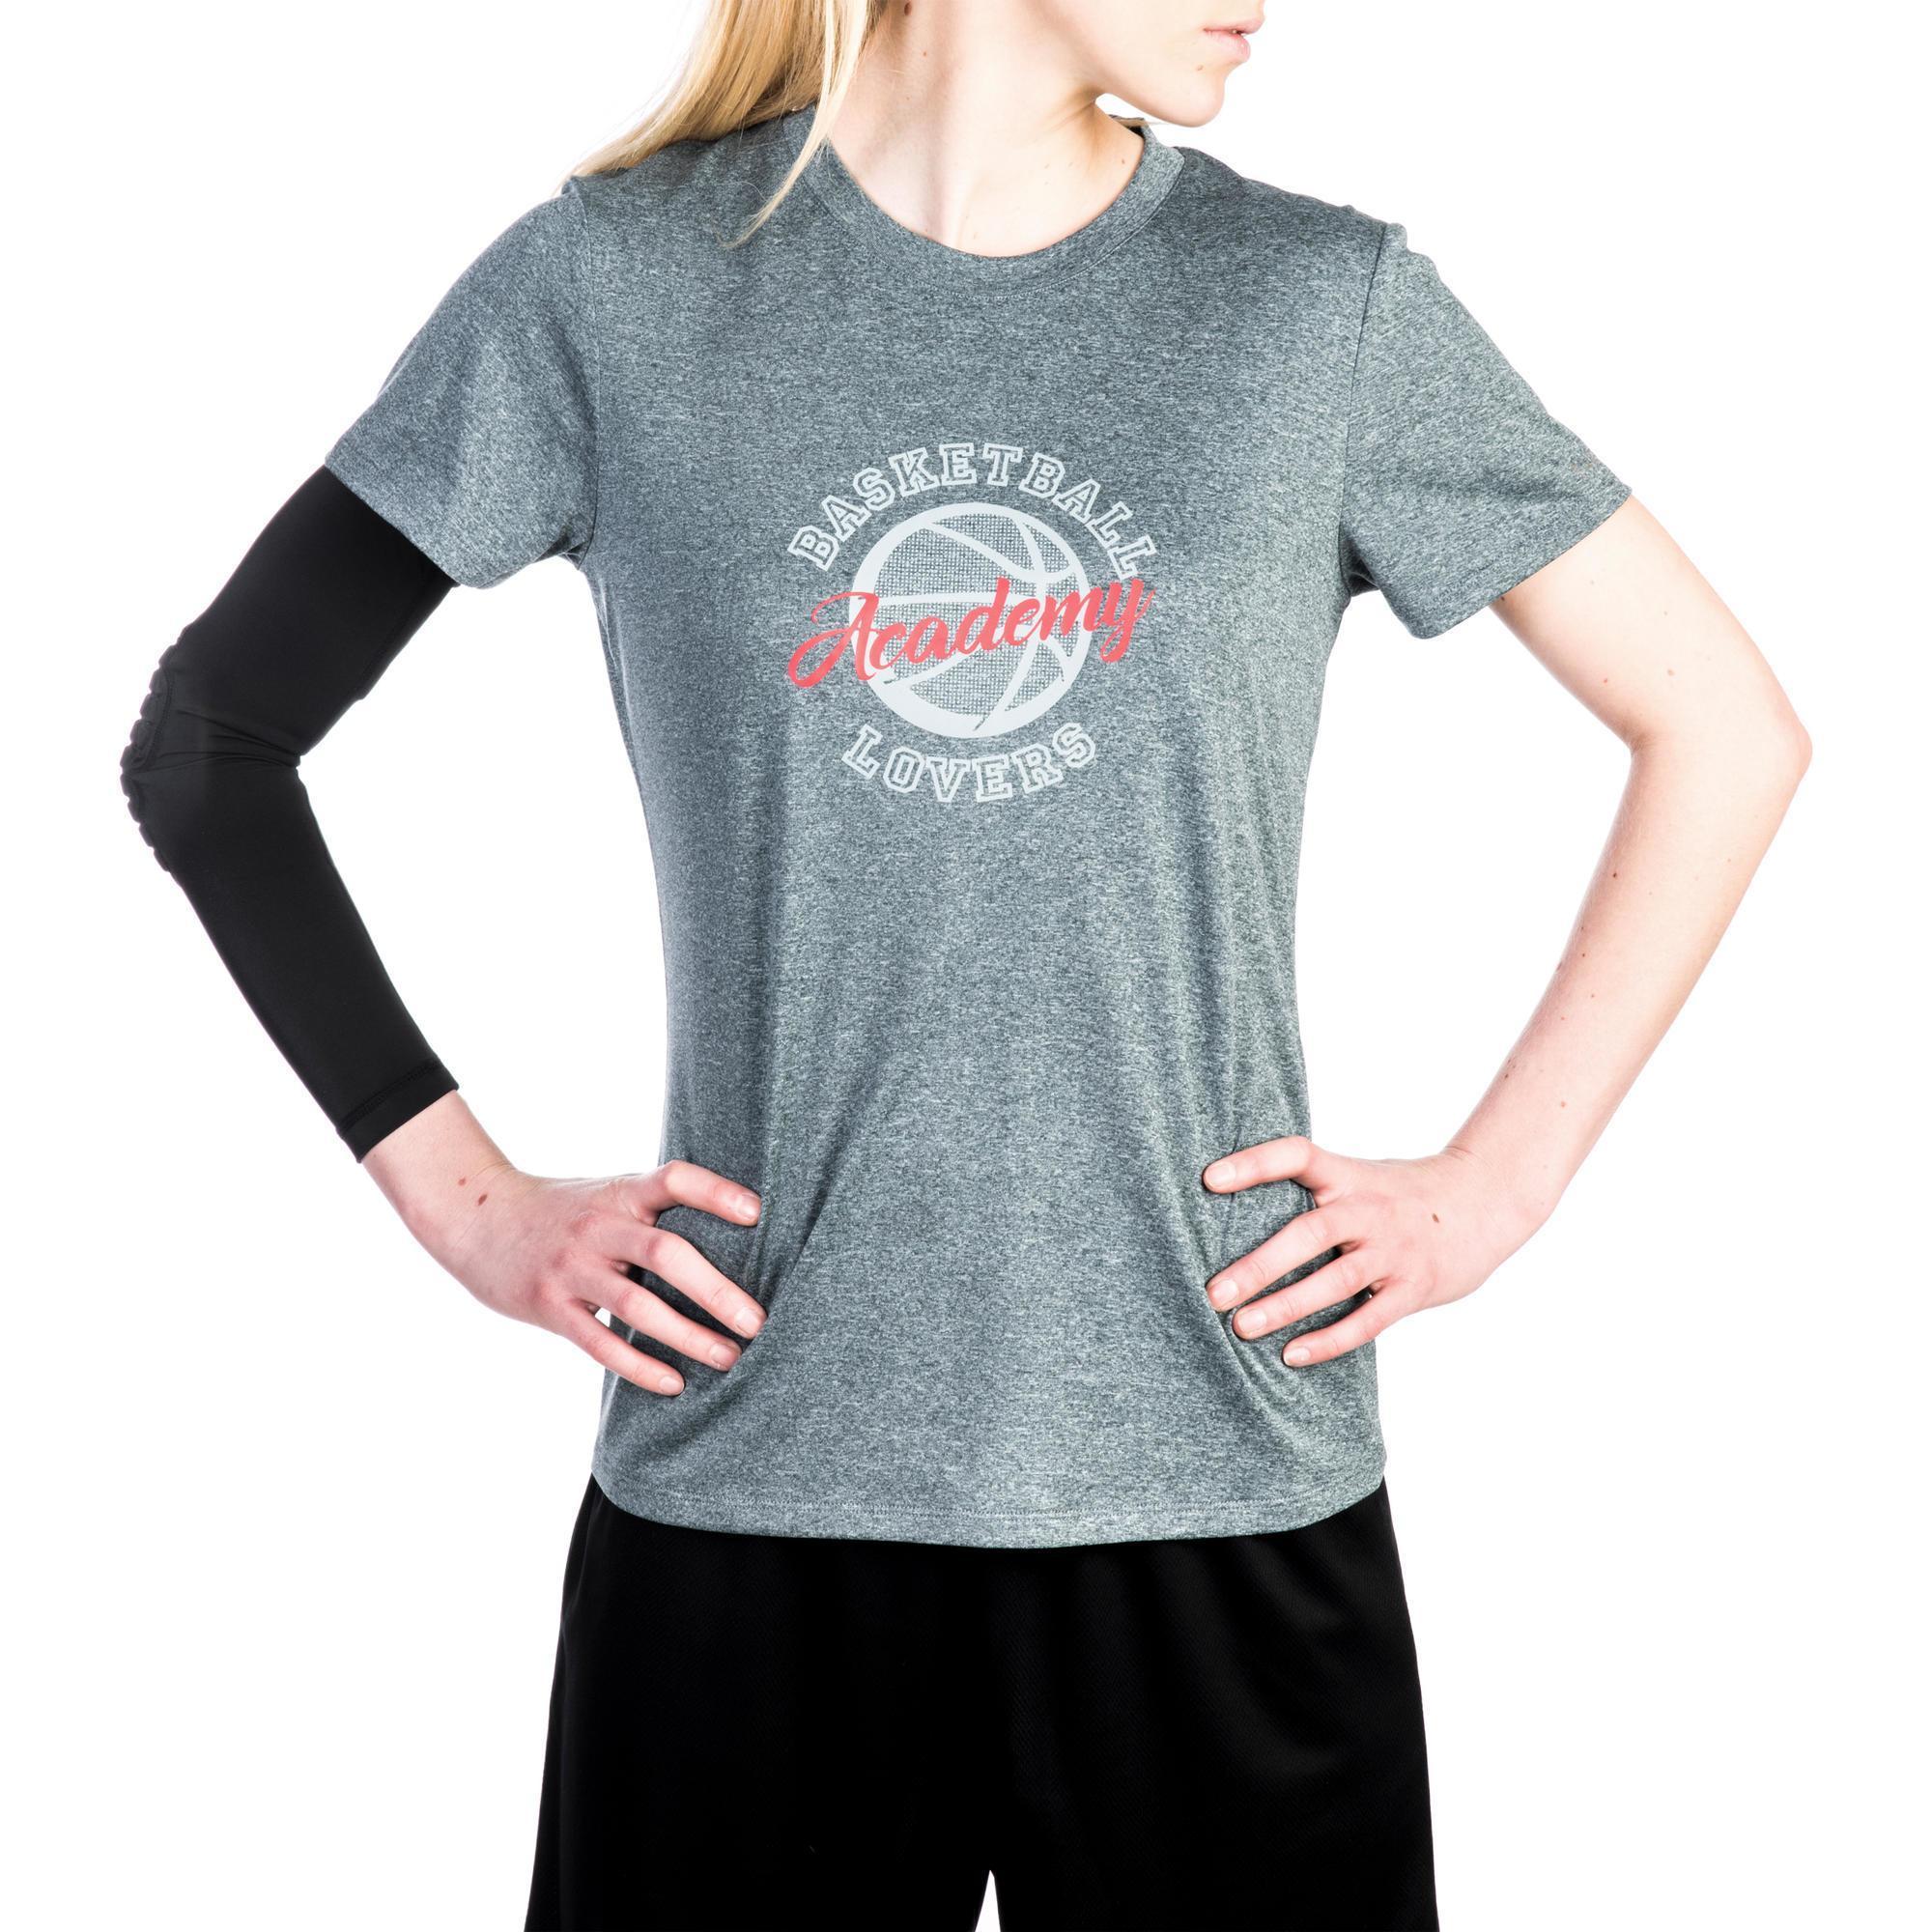 95a2daefa2910 Shirt De Cleveland Confirmee Fast Tarmak Basket Pour Tee Femme gq5xUtPH